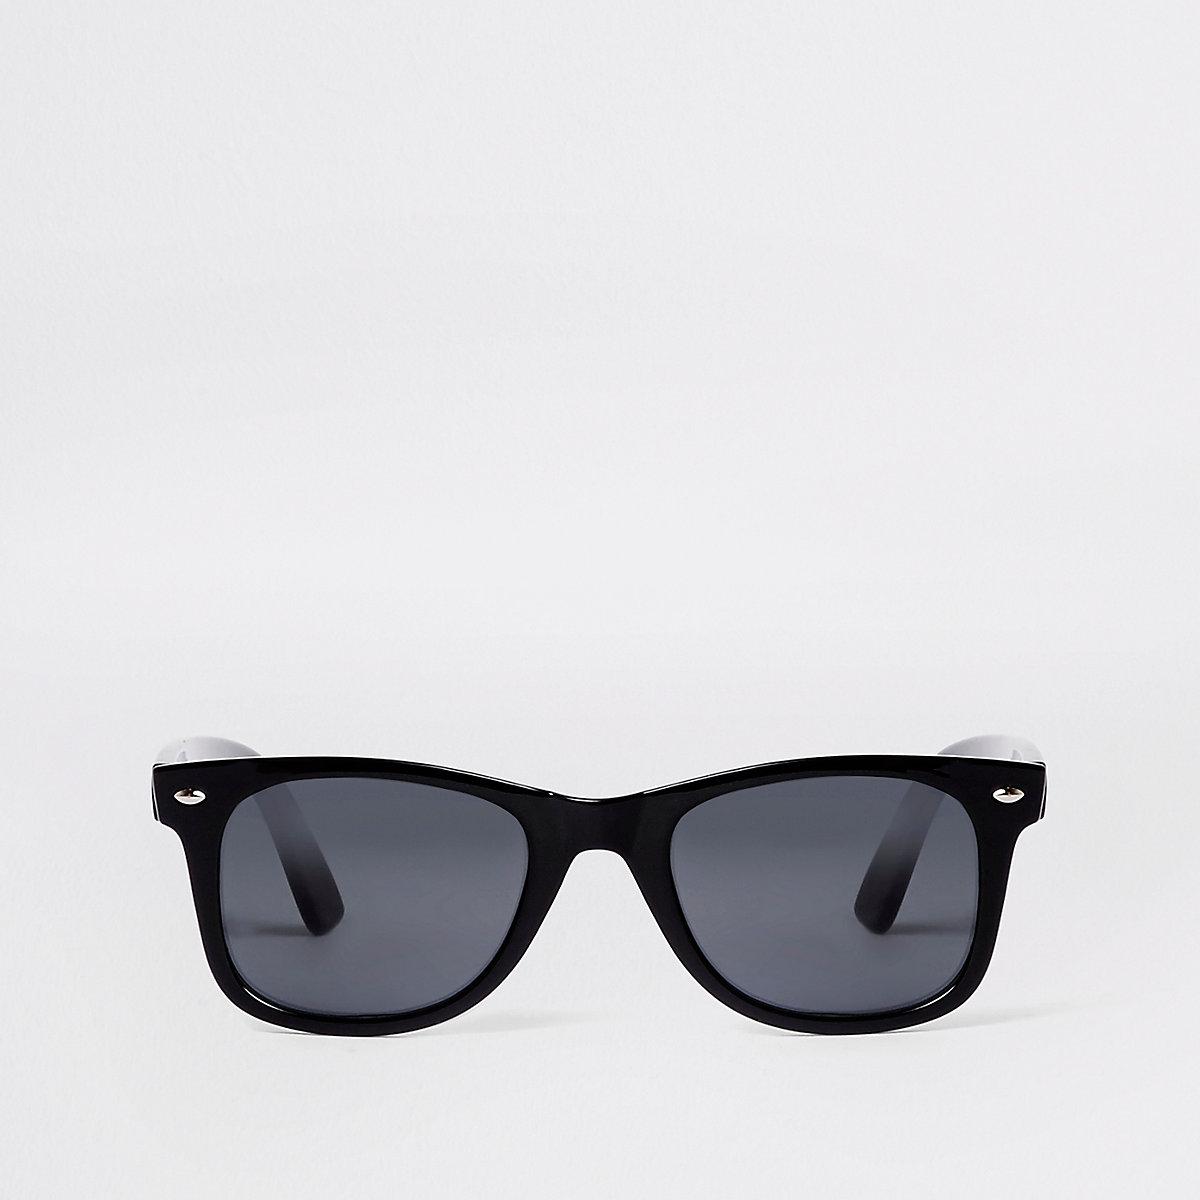 Black shiny retro sunglasses